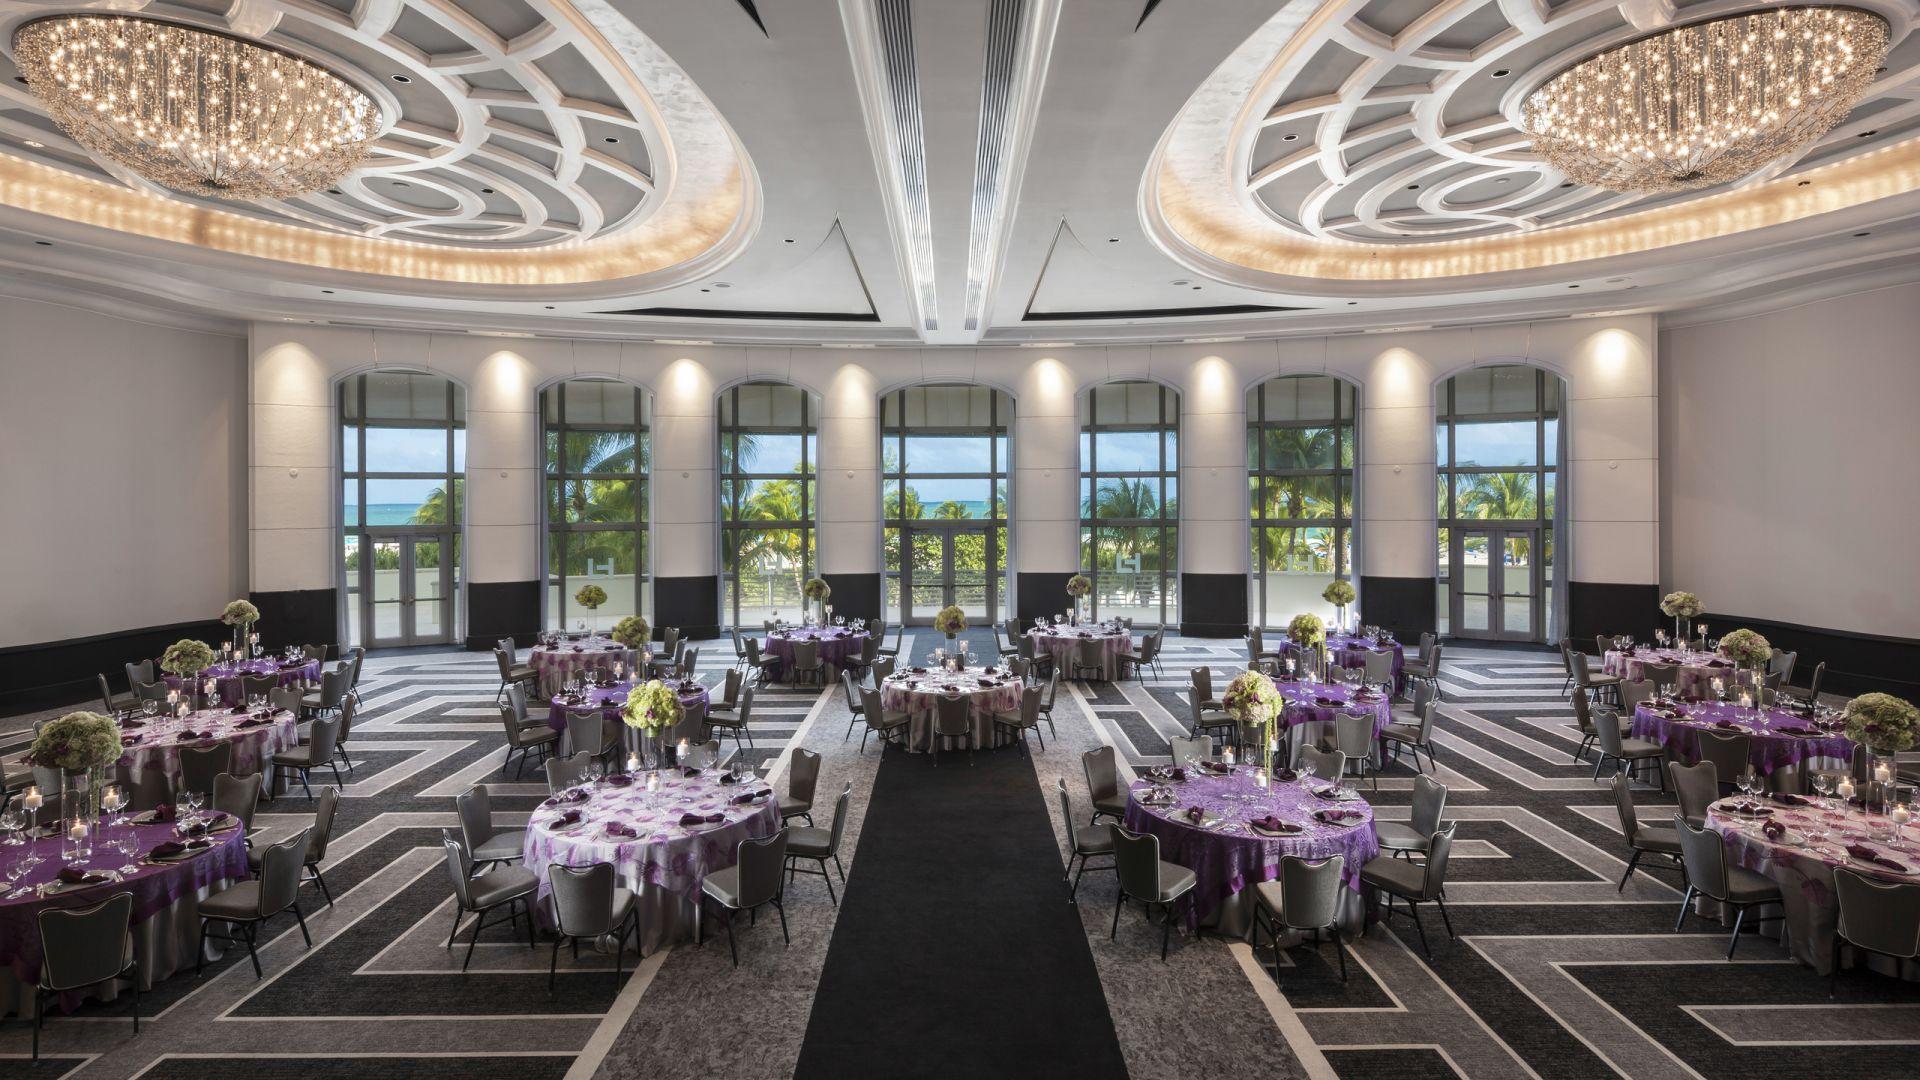 Salle de bal Americana avec vue sur l'océan | Loews Miami Beach Hotel